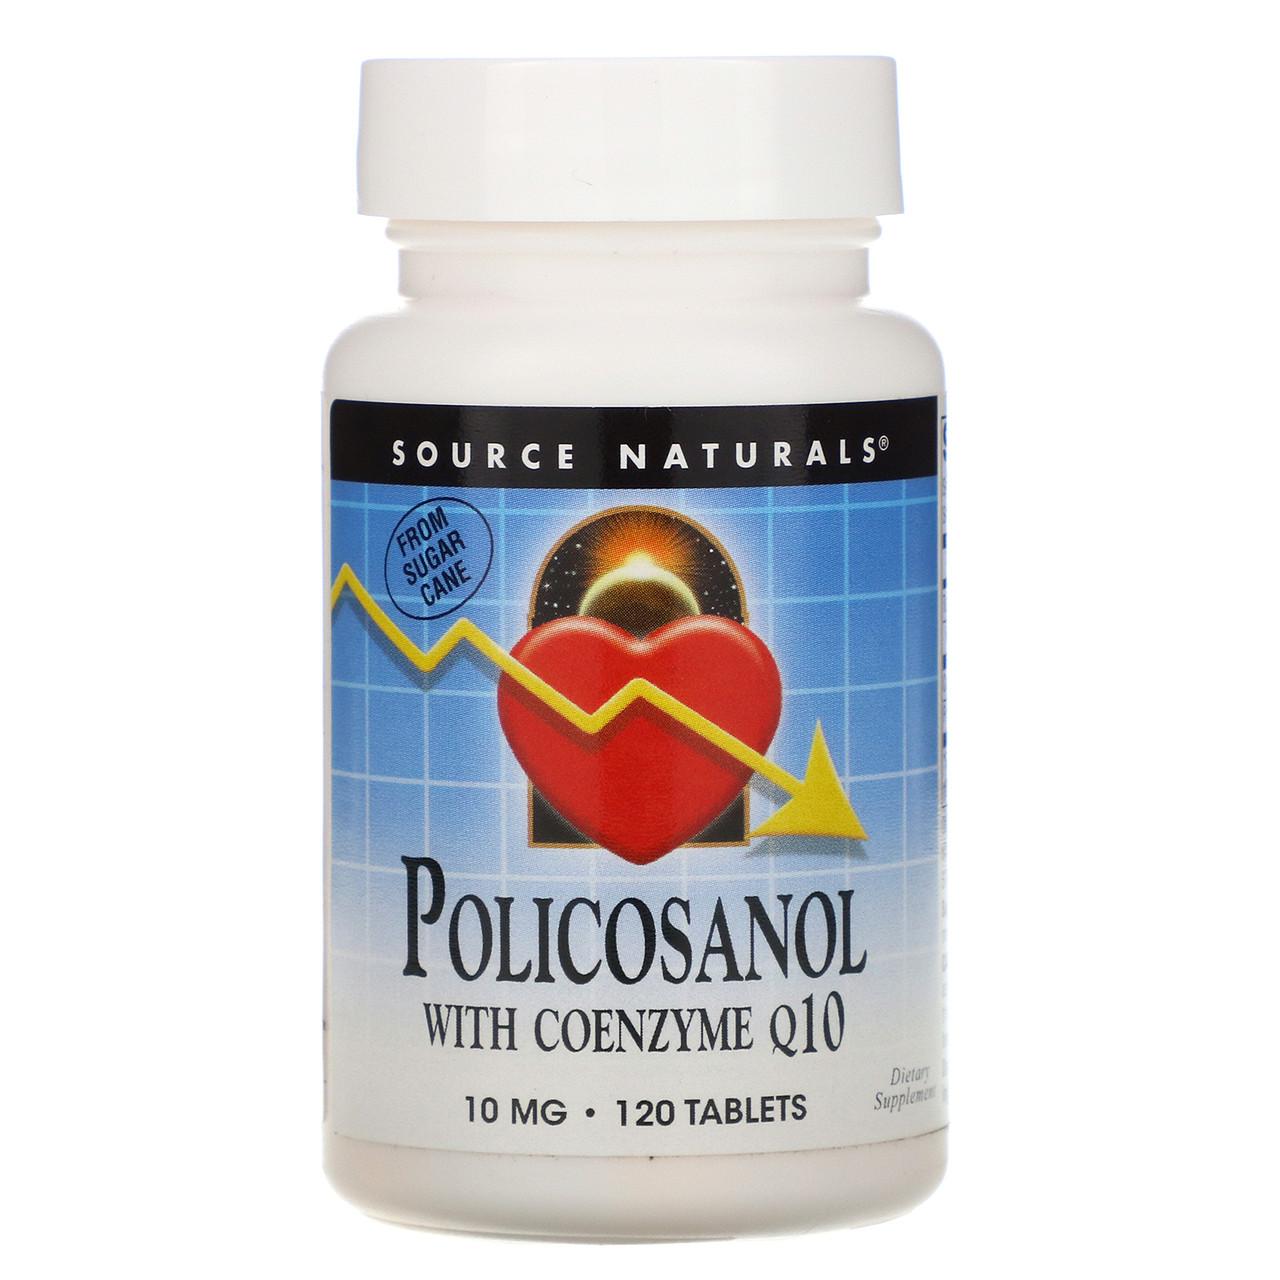 Поликозанол і коэнзимQ10 (Policosanol), Source Naturals,120 табл.